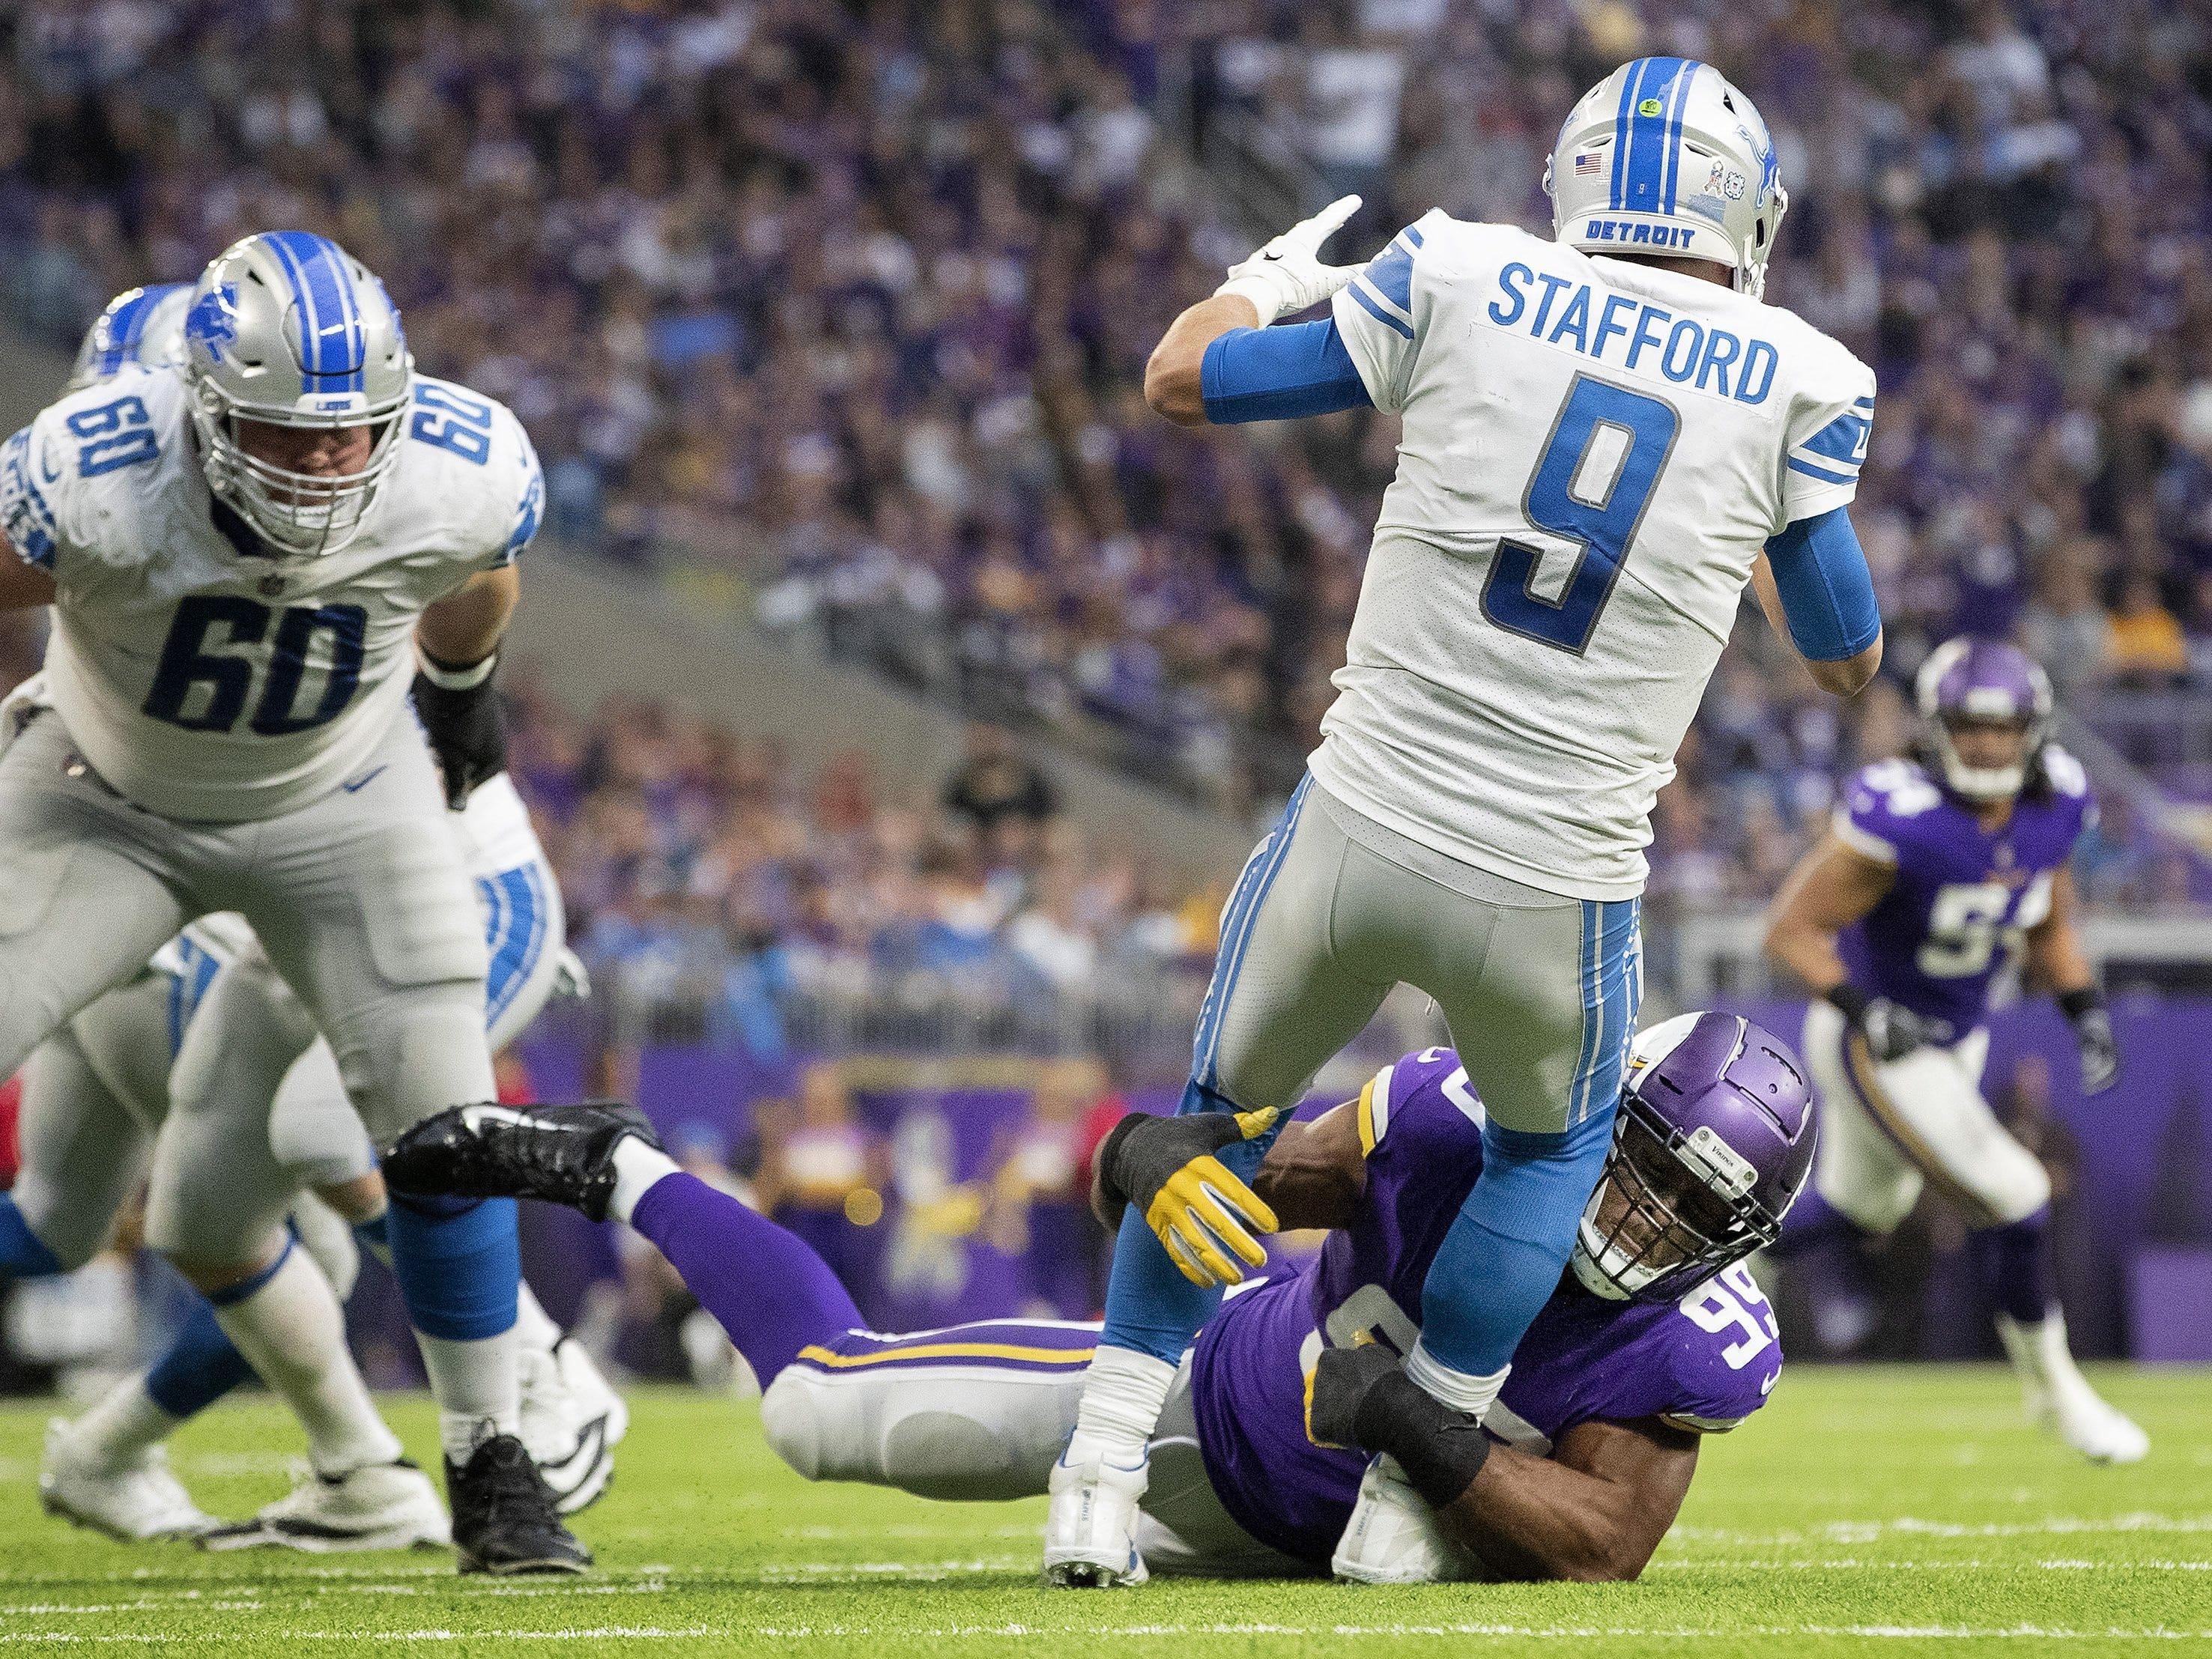 Vikings defensive lineman Danielle Hunter sacks Lions quarterback Matthew Stafford in the third quarter of the Lions' 24-9 loss on Sunday, Nov. 4, 2018, in Minneapolis.